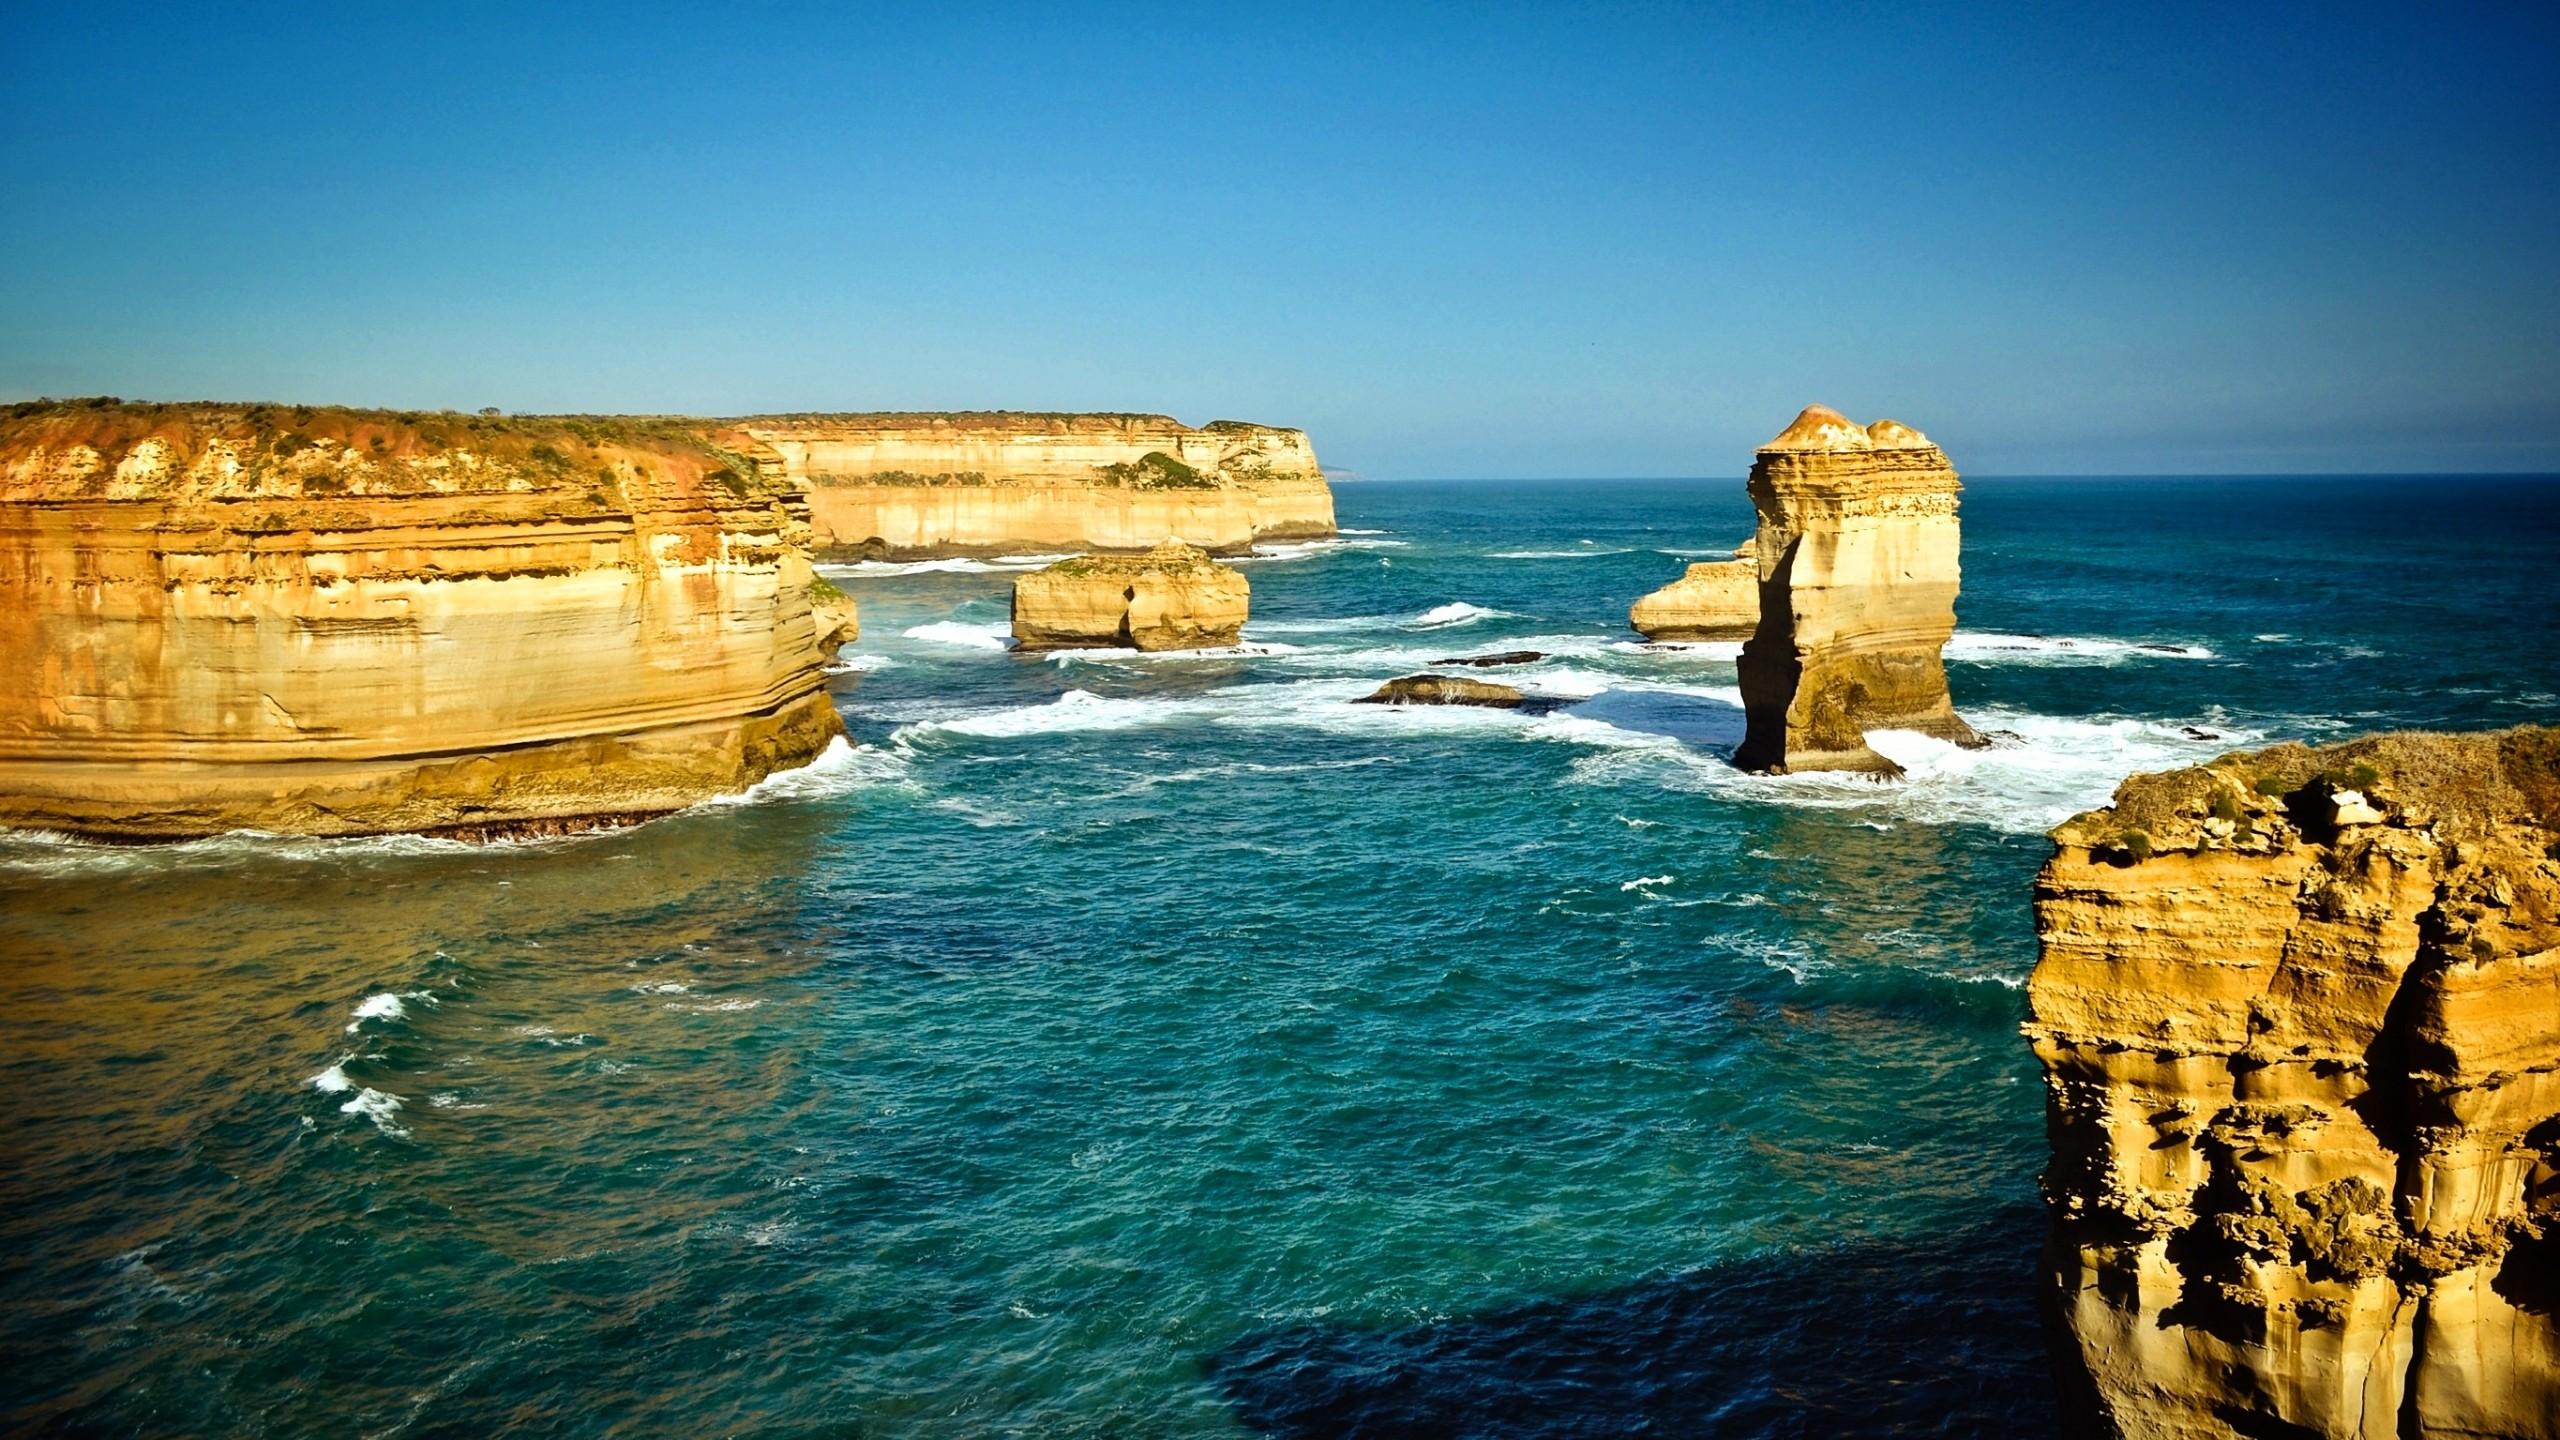 Australia Wallpaper Desktop (53+ Images